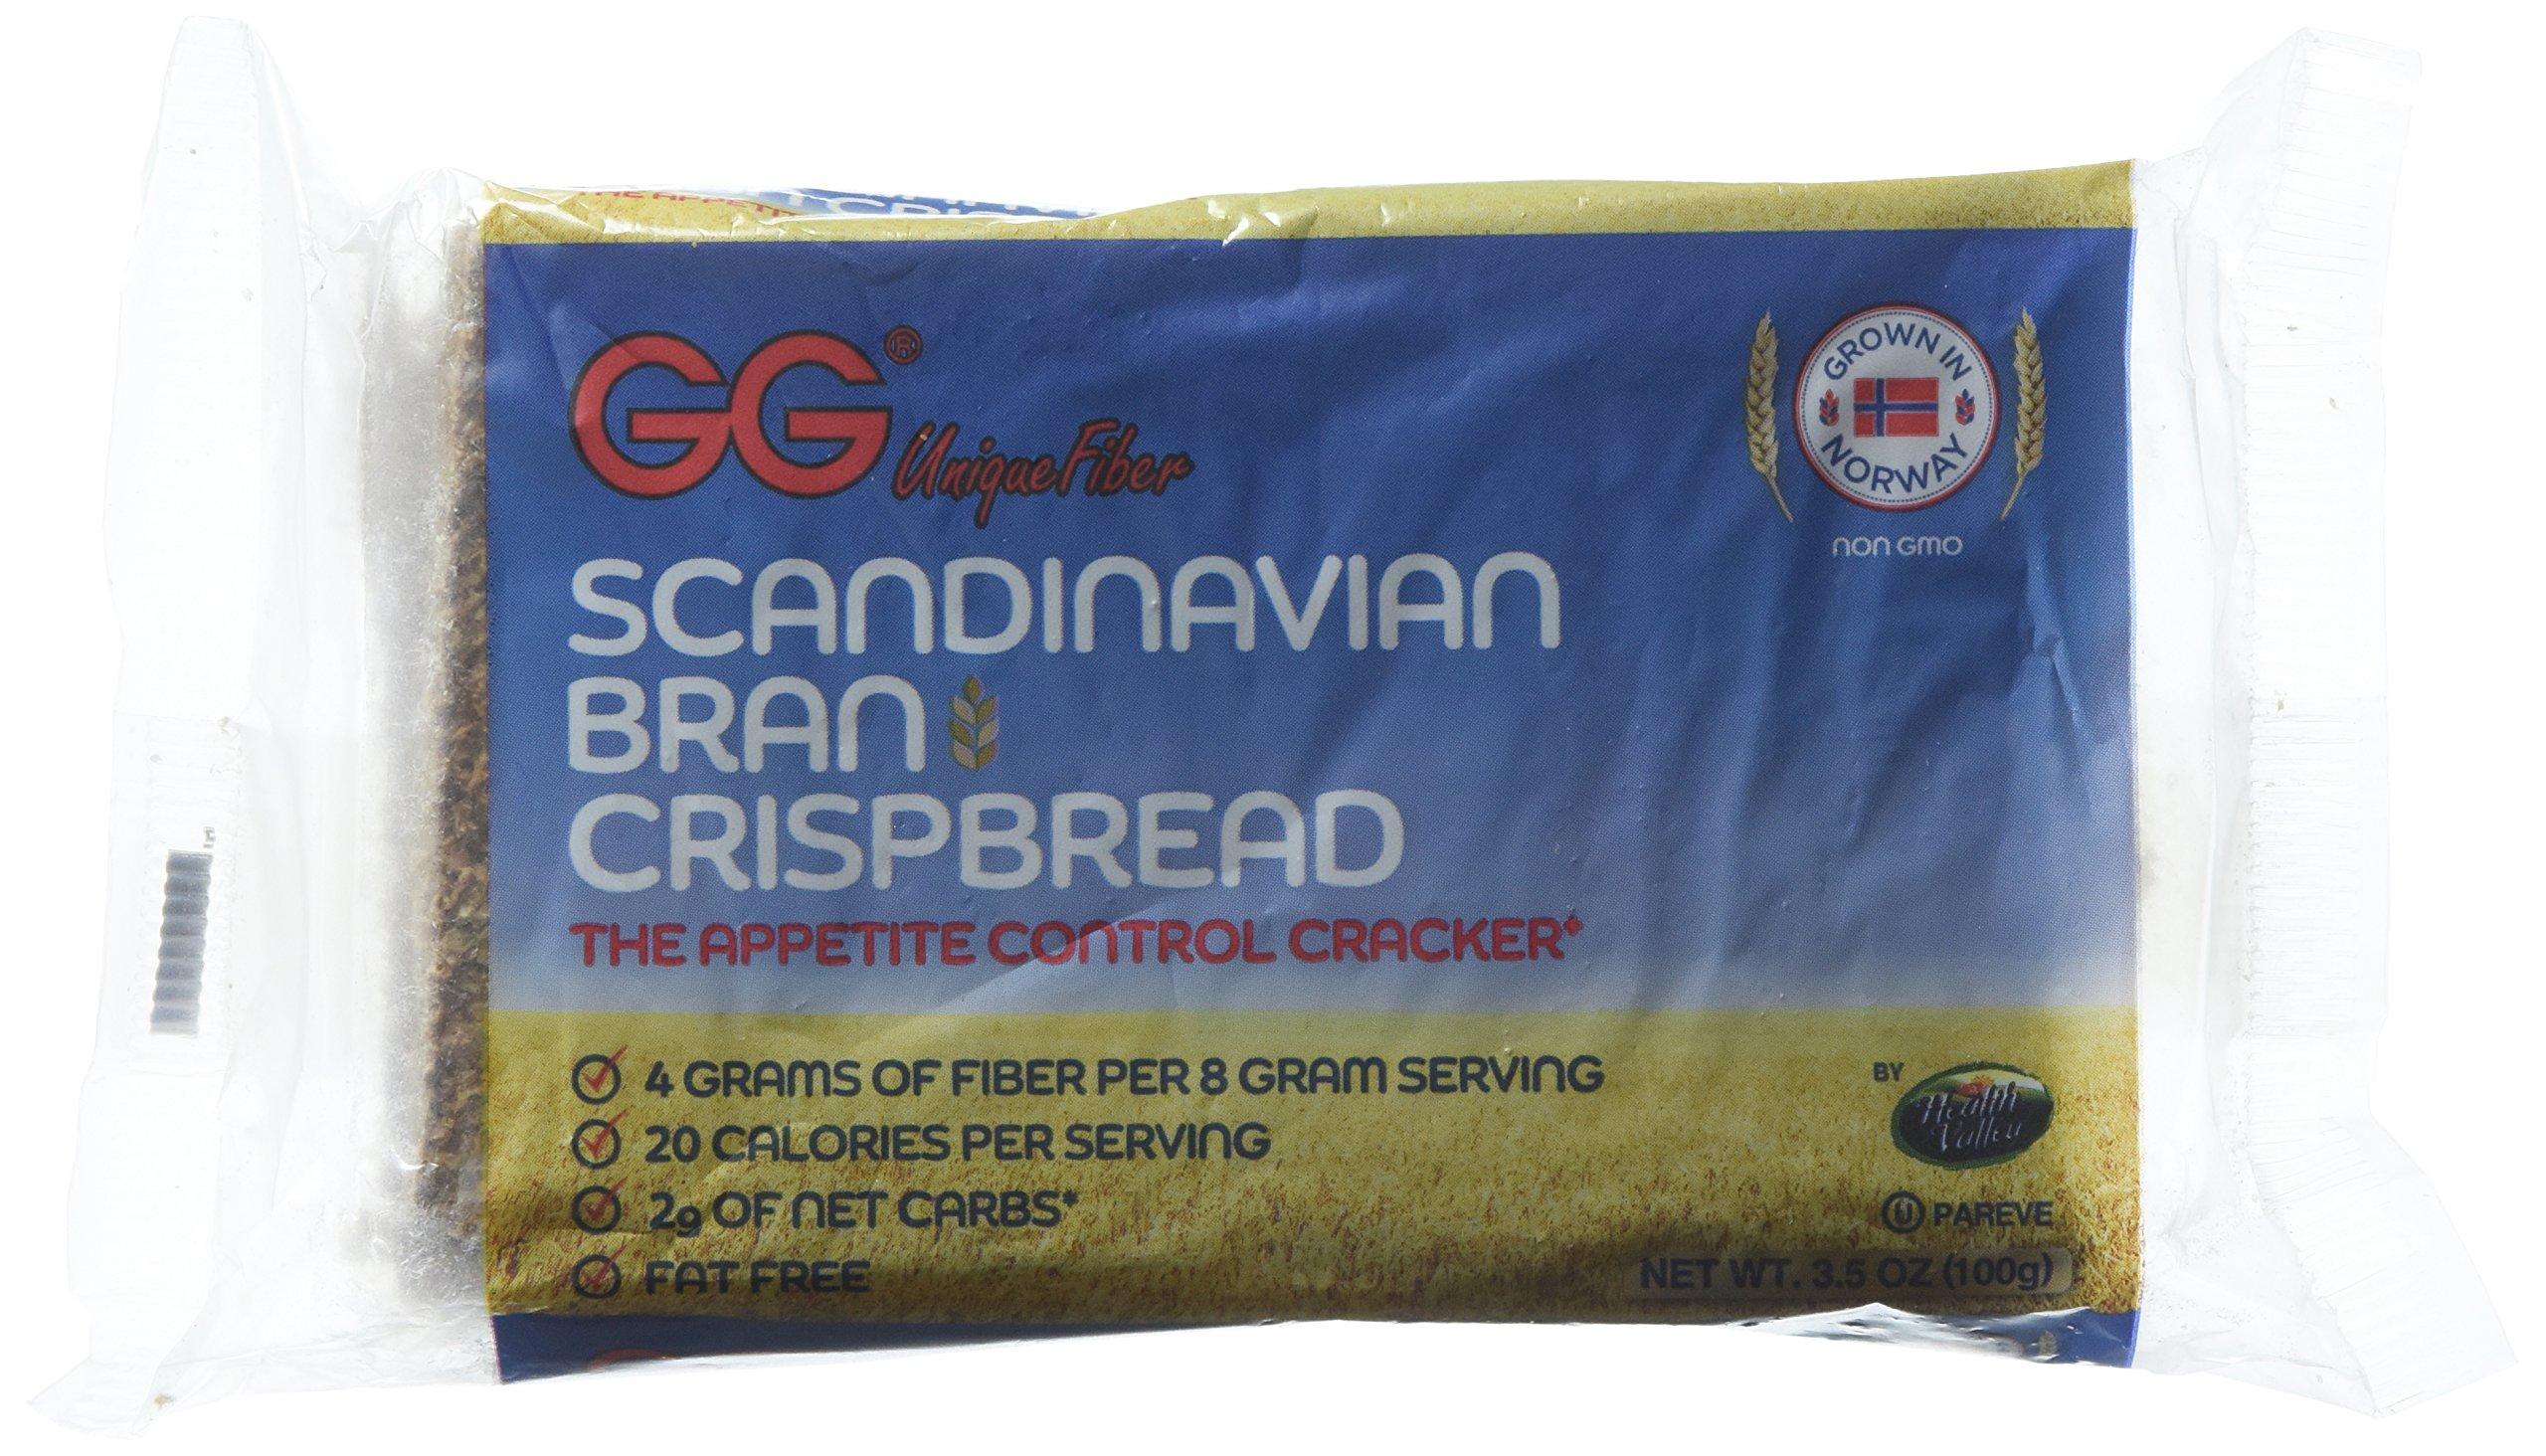 Health Valley Crispbread Gg Bran,Pack of 10